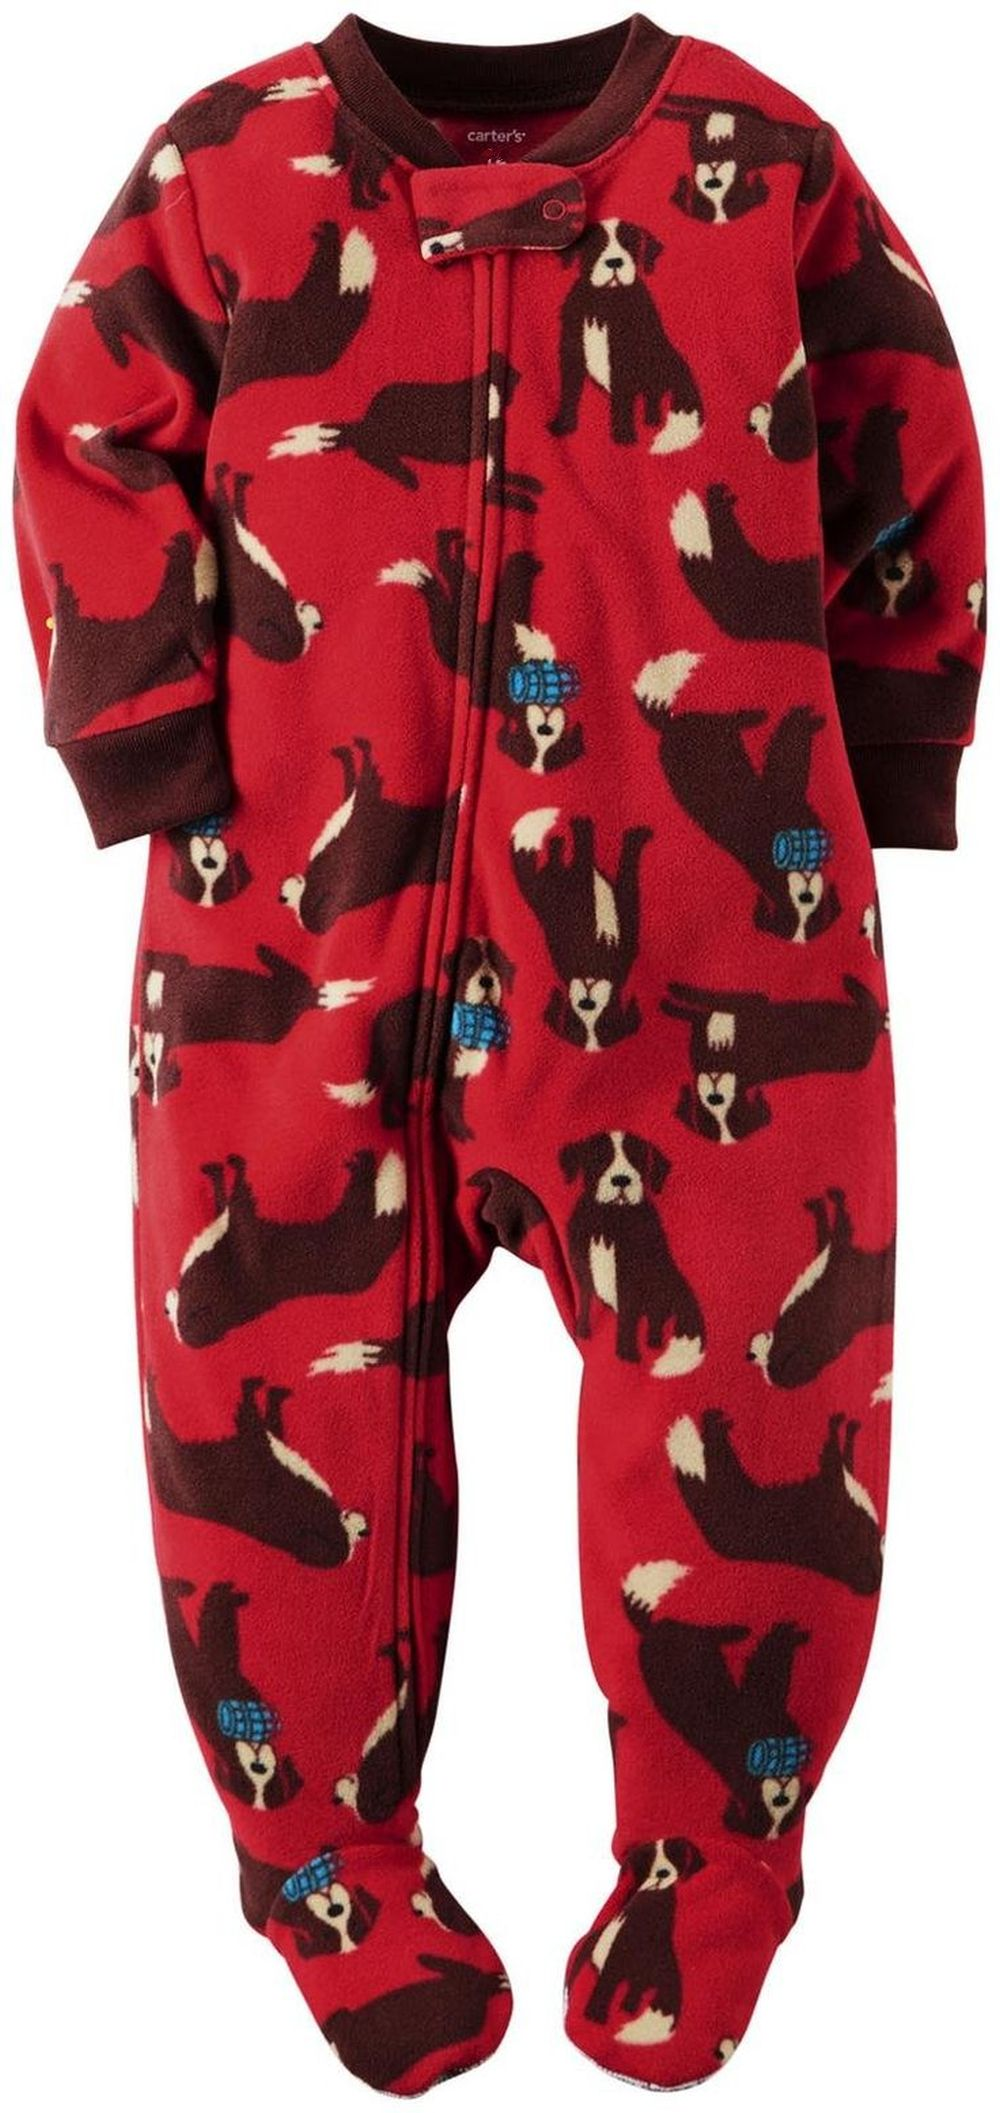 934721baa Carter s Boy s Size 6 ST. Bernard Rescue Dog Fleece Footed Pajama ...